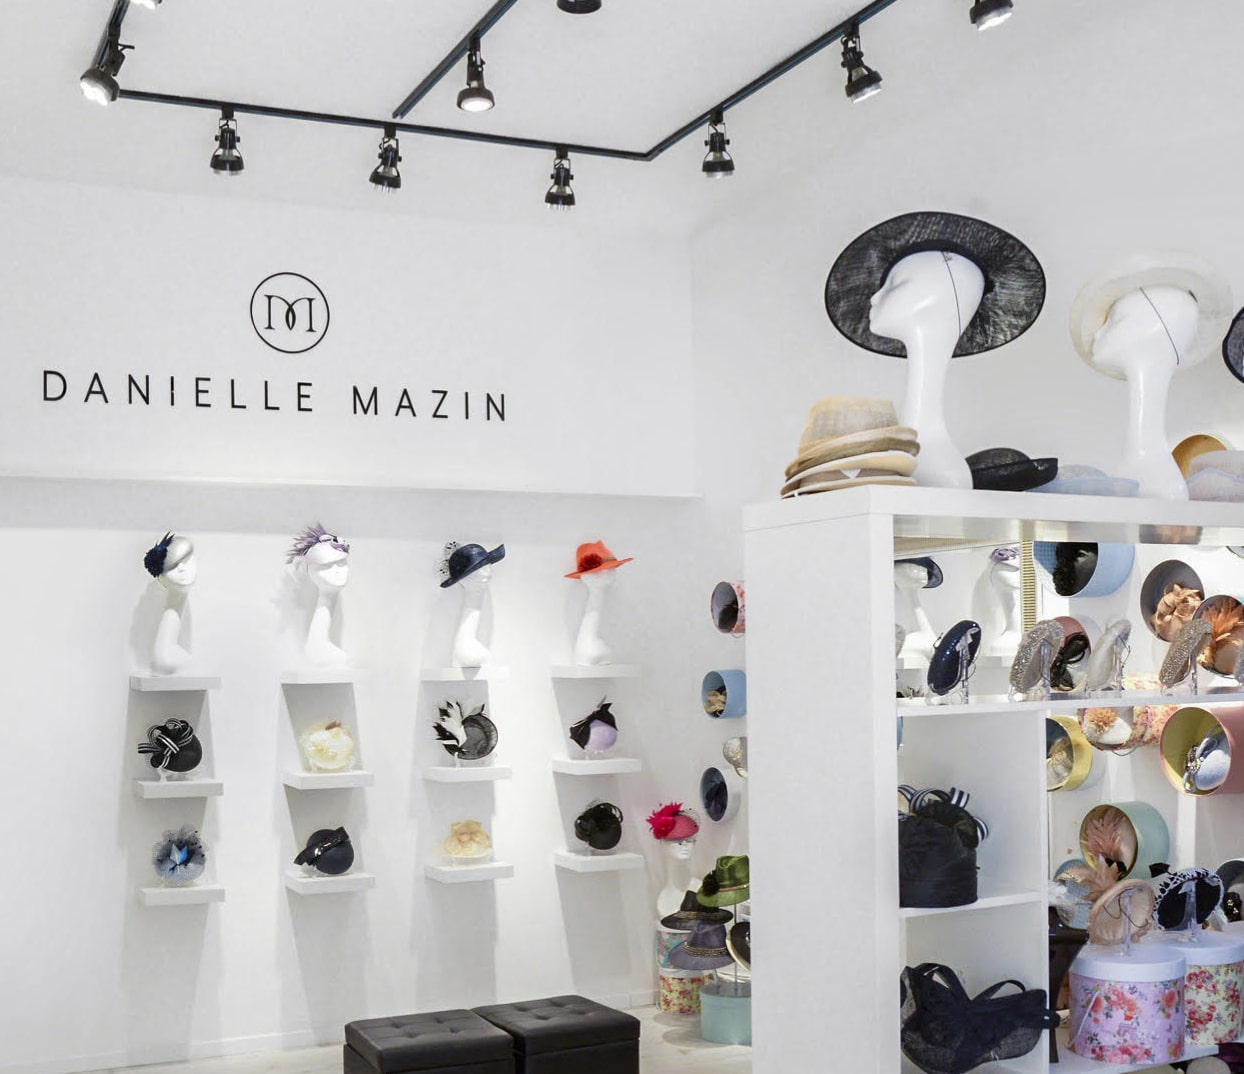 Danielle Mazin, Headwear Designer